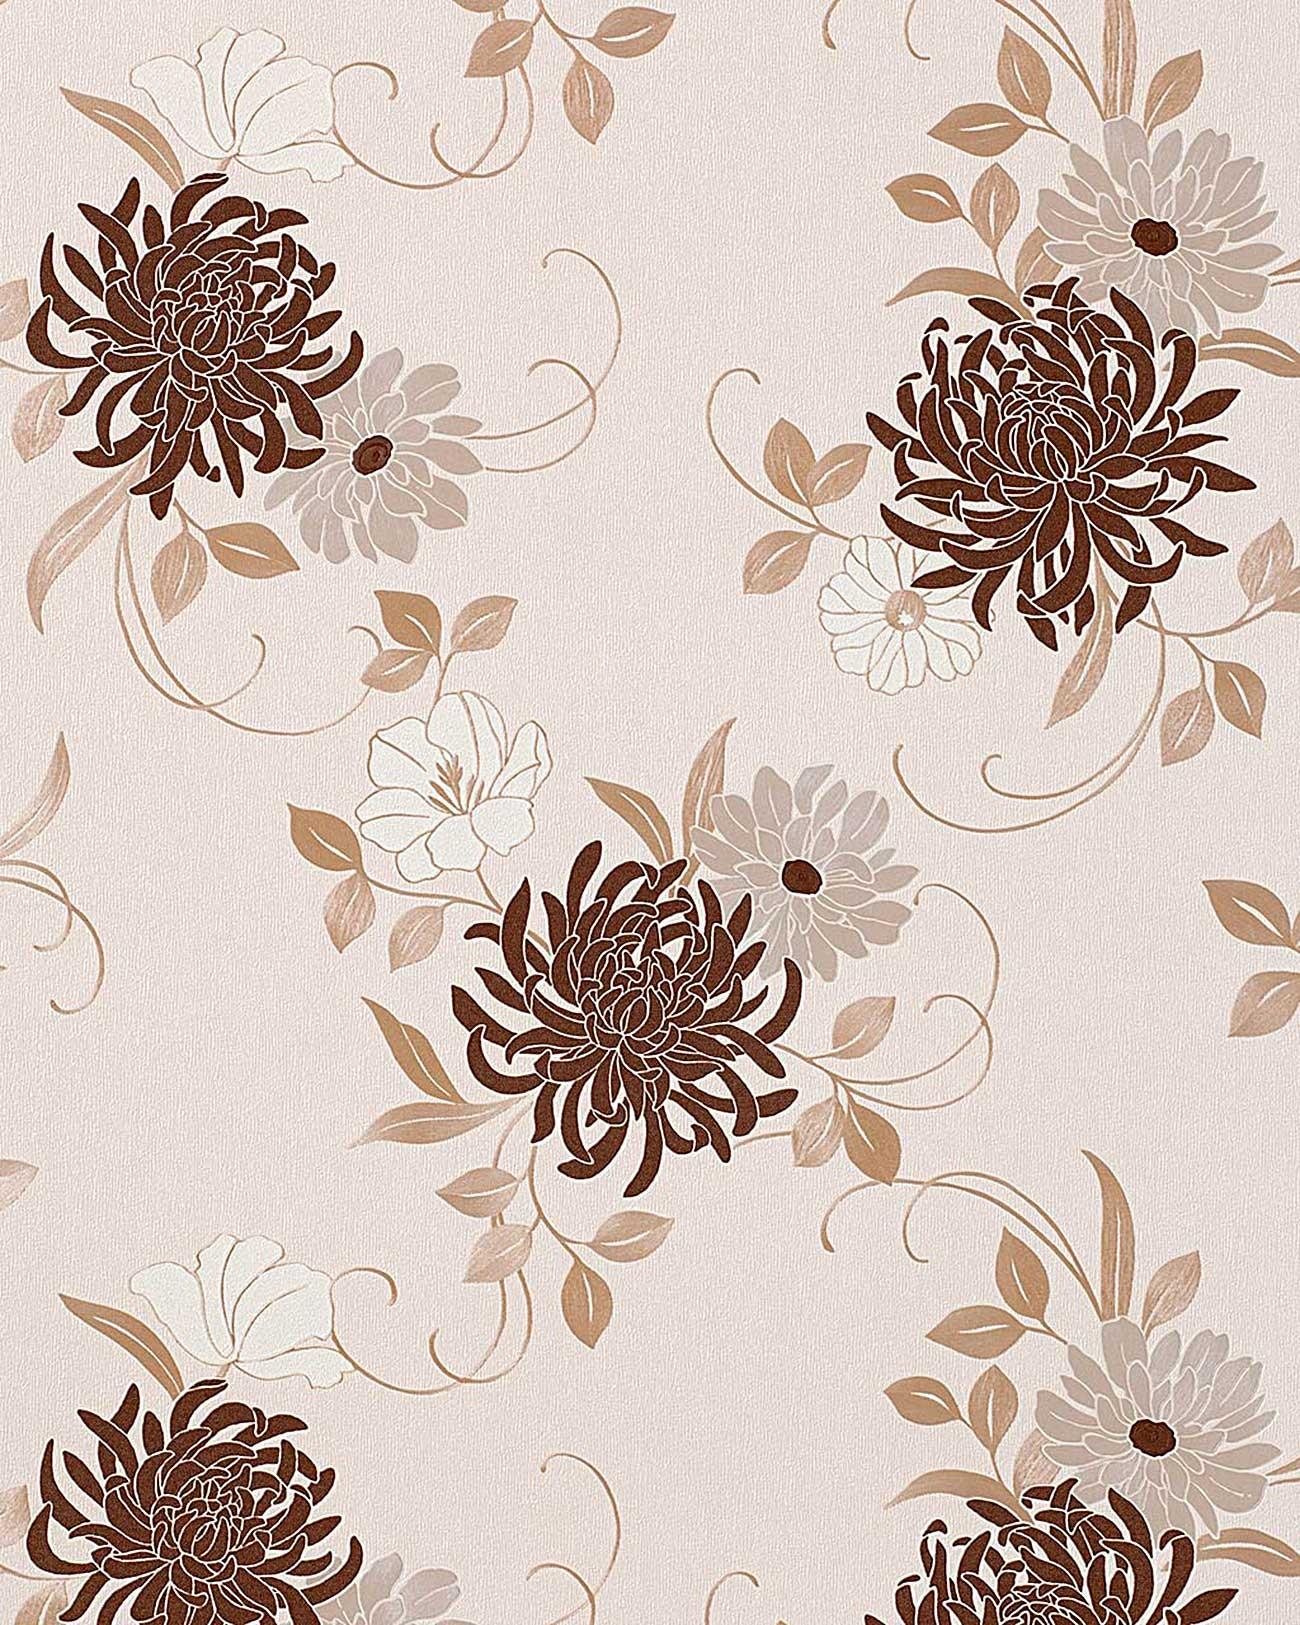 EDEM 824 23 Deep Embossed Heavyweight Floral Flower Wallpaper Wall